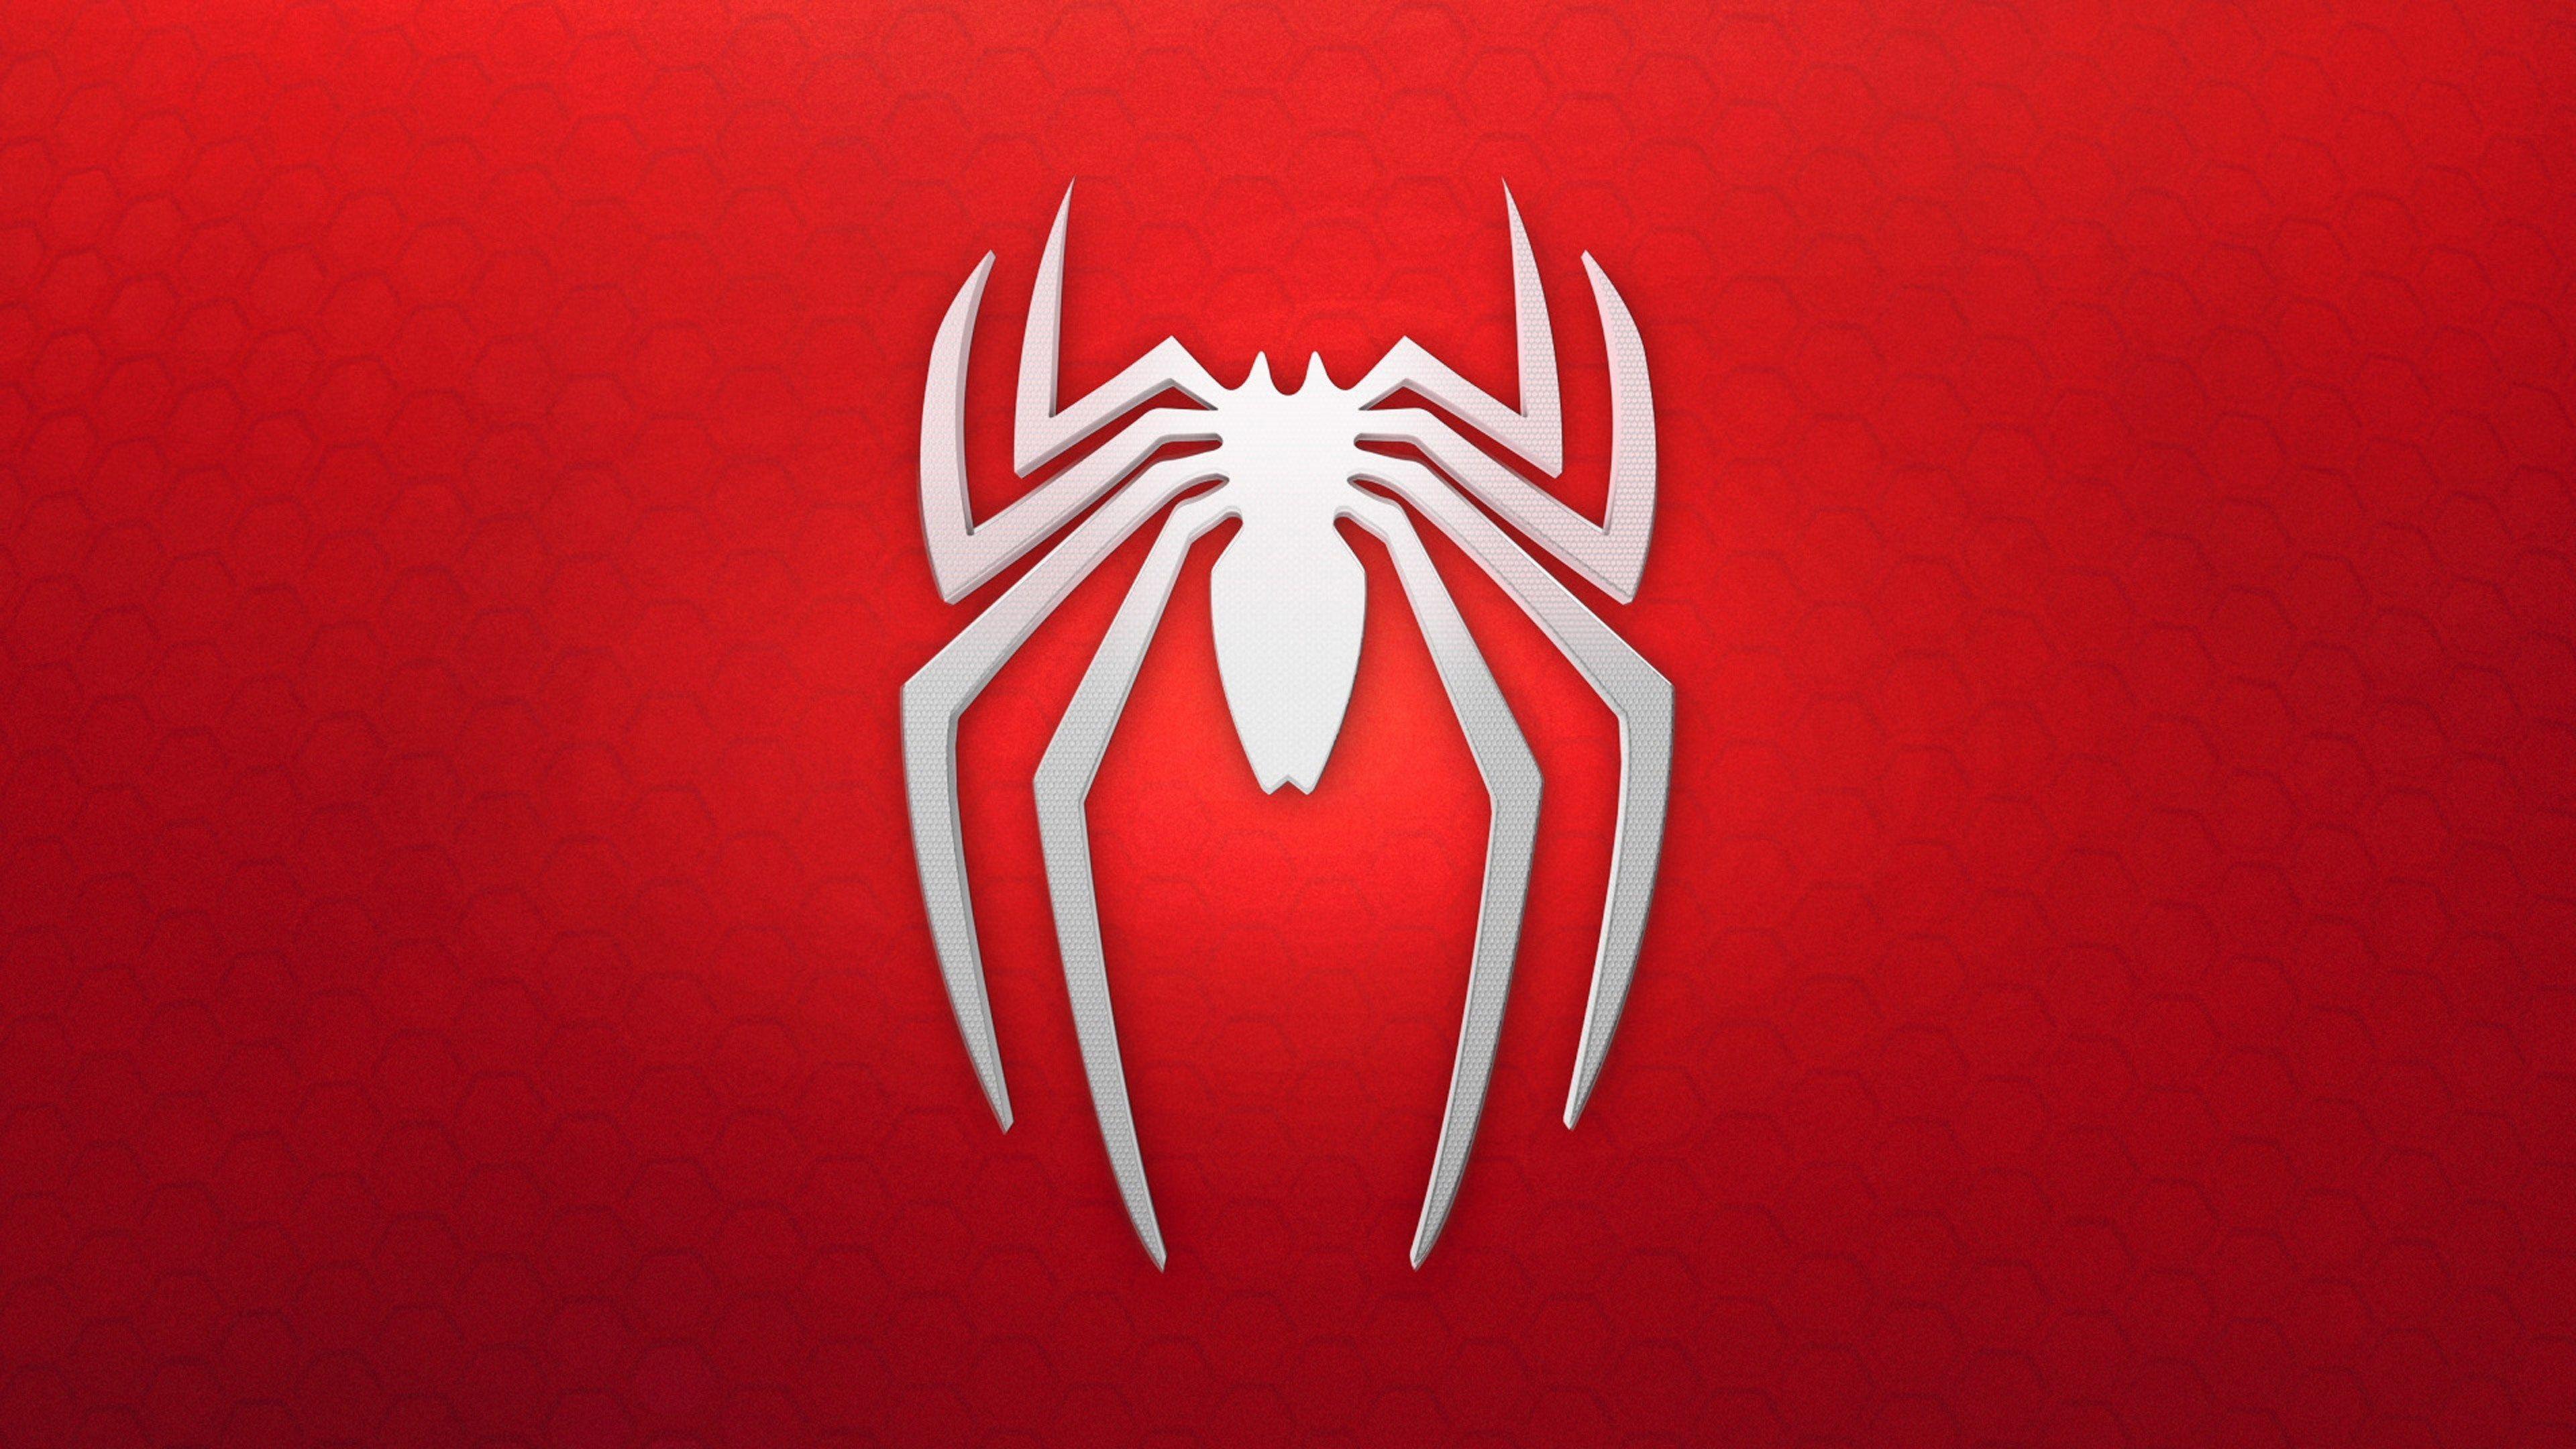 3840x2160 Spiderman 4k Desktop Wallpaper Hd Quality Spiderman Ps4 Wallpaper Marvel Spiderman Spider Man Ps4 Game